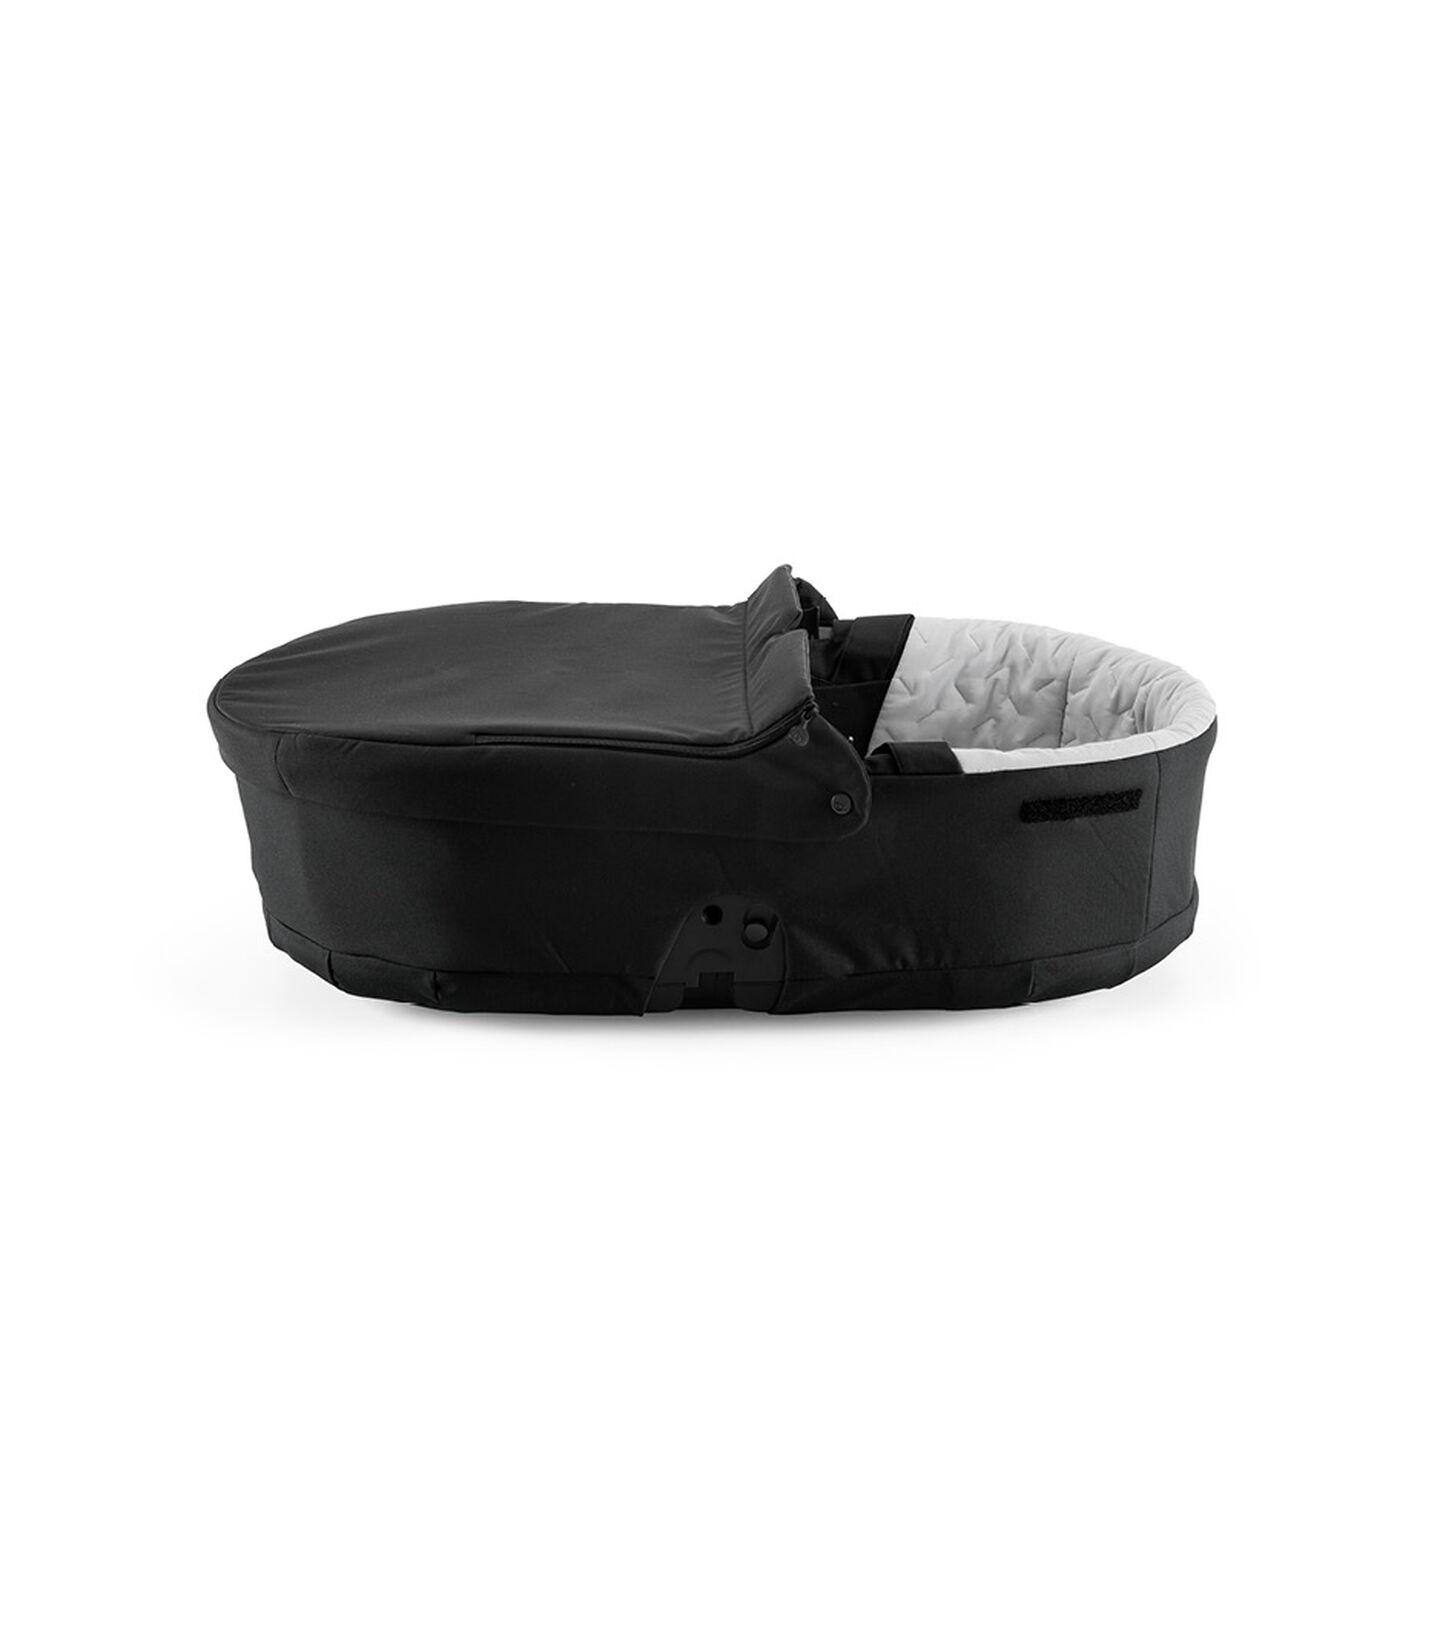 Stokke® Beat Carry Cot Black, Noir, mainview view 1